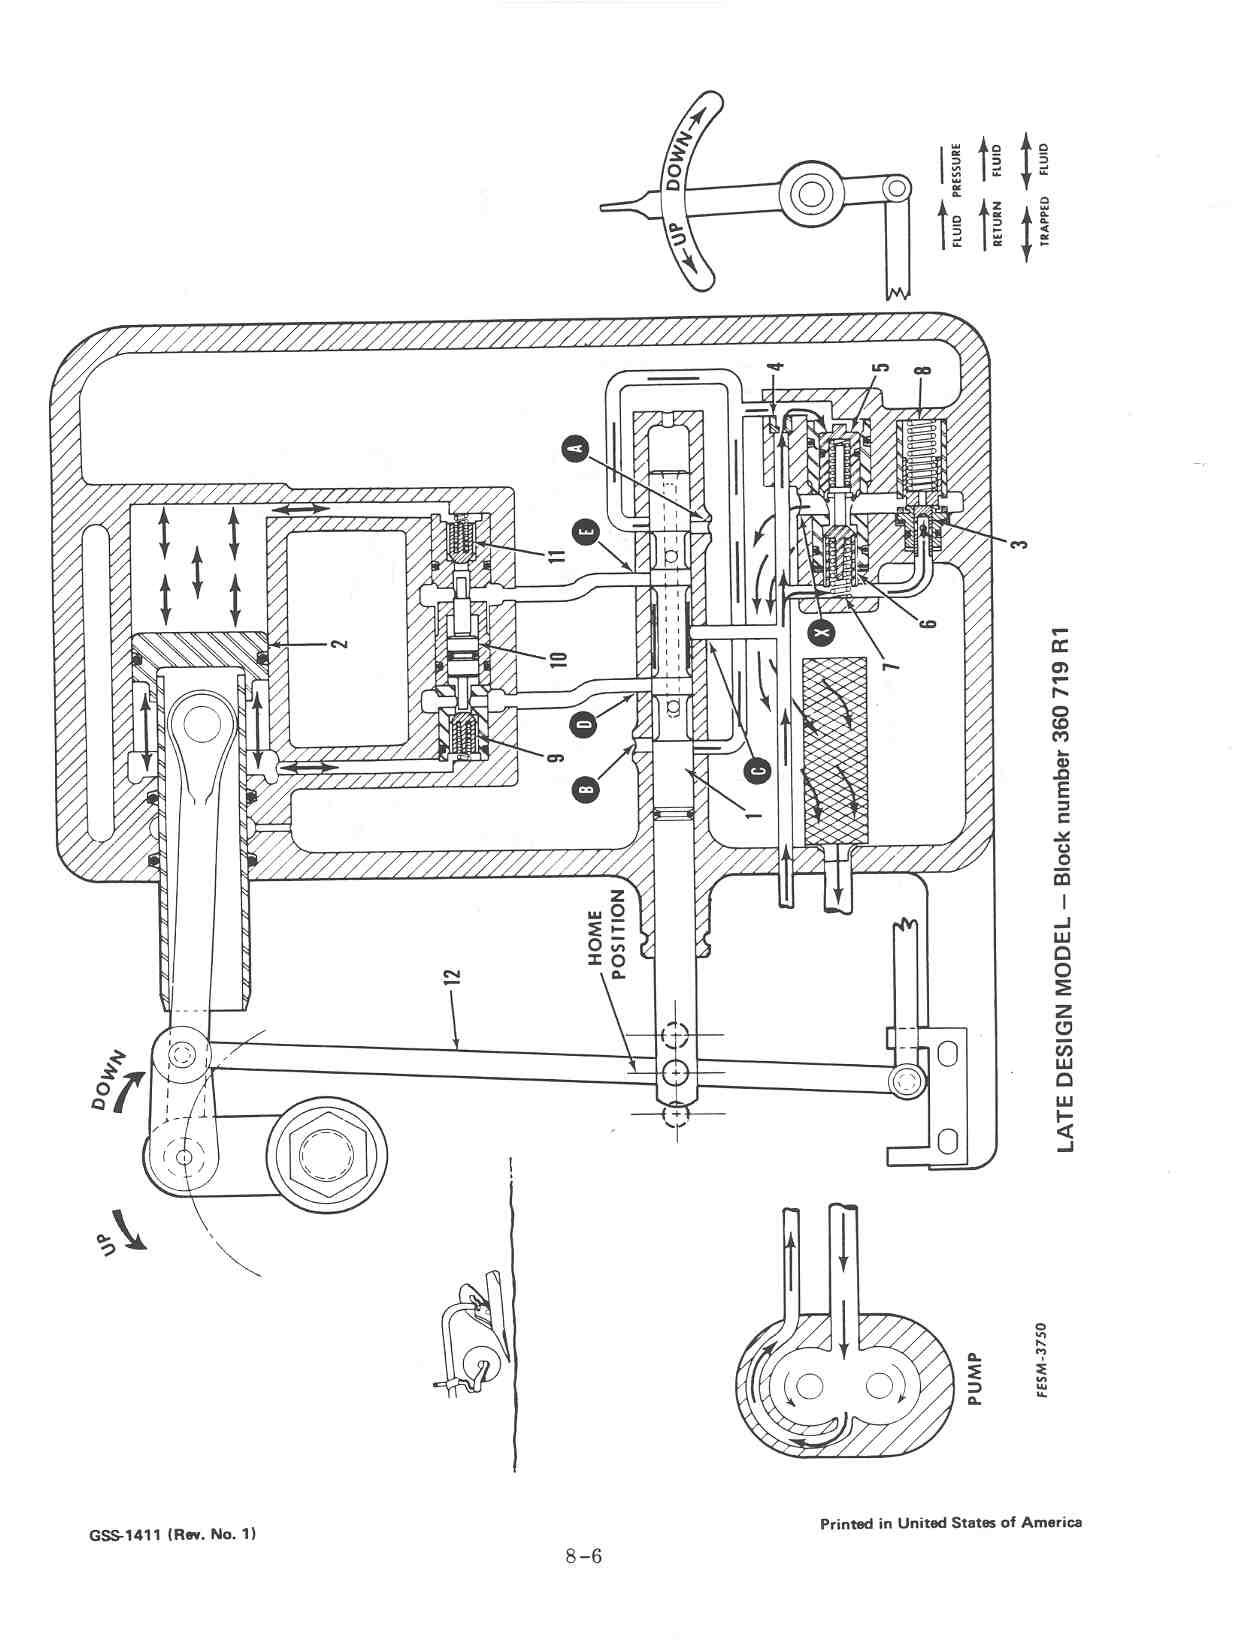 Farmall Cub Touch Control Diagram Electrical Wiring Diagrams International Tractor Section 8 Hydraulic System